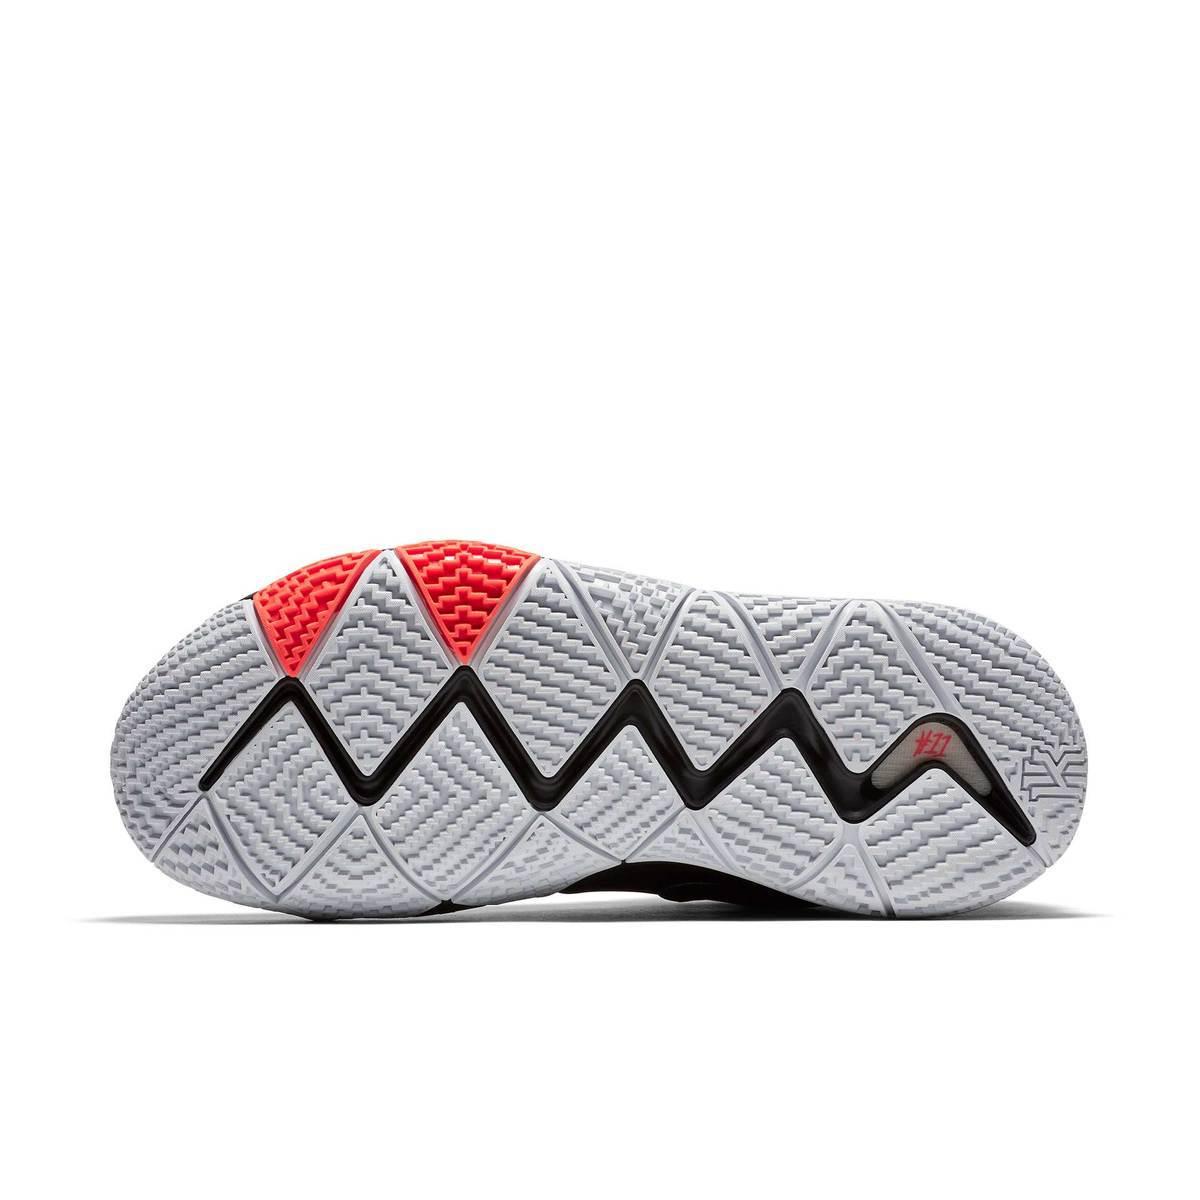 Nike Kyrie 4 EP Original